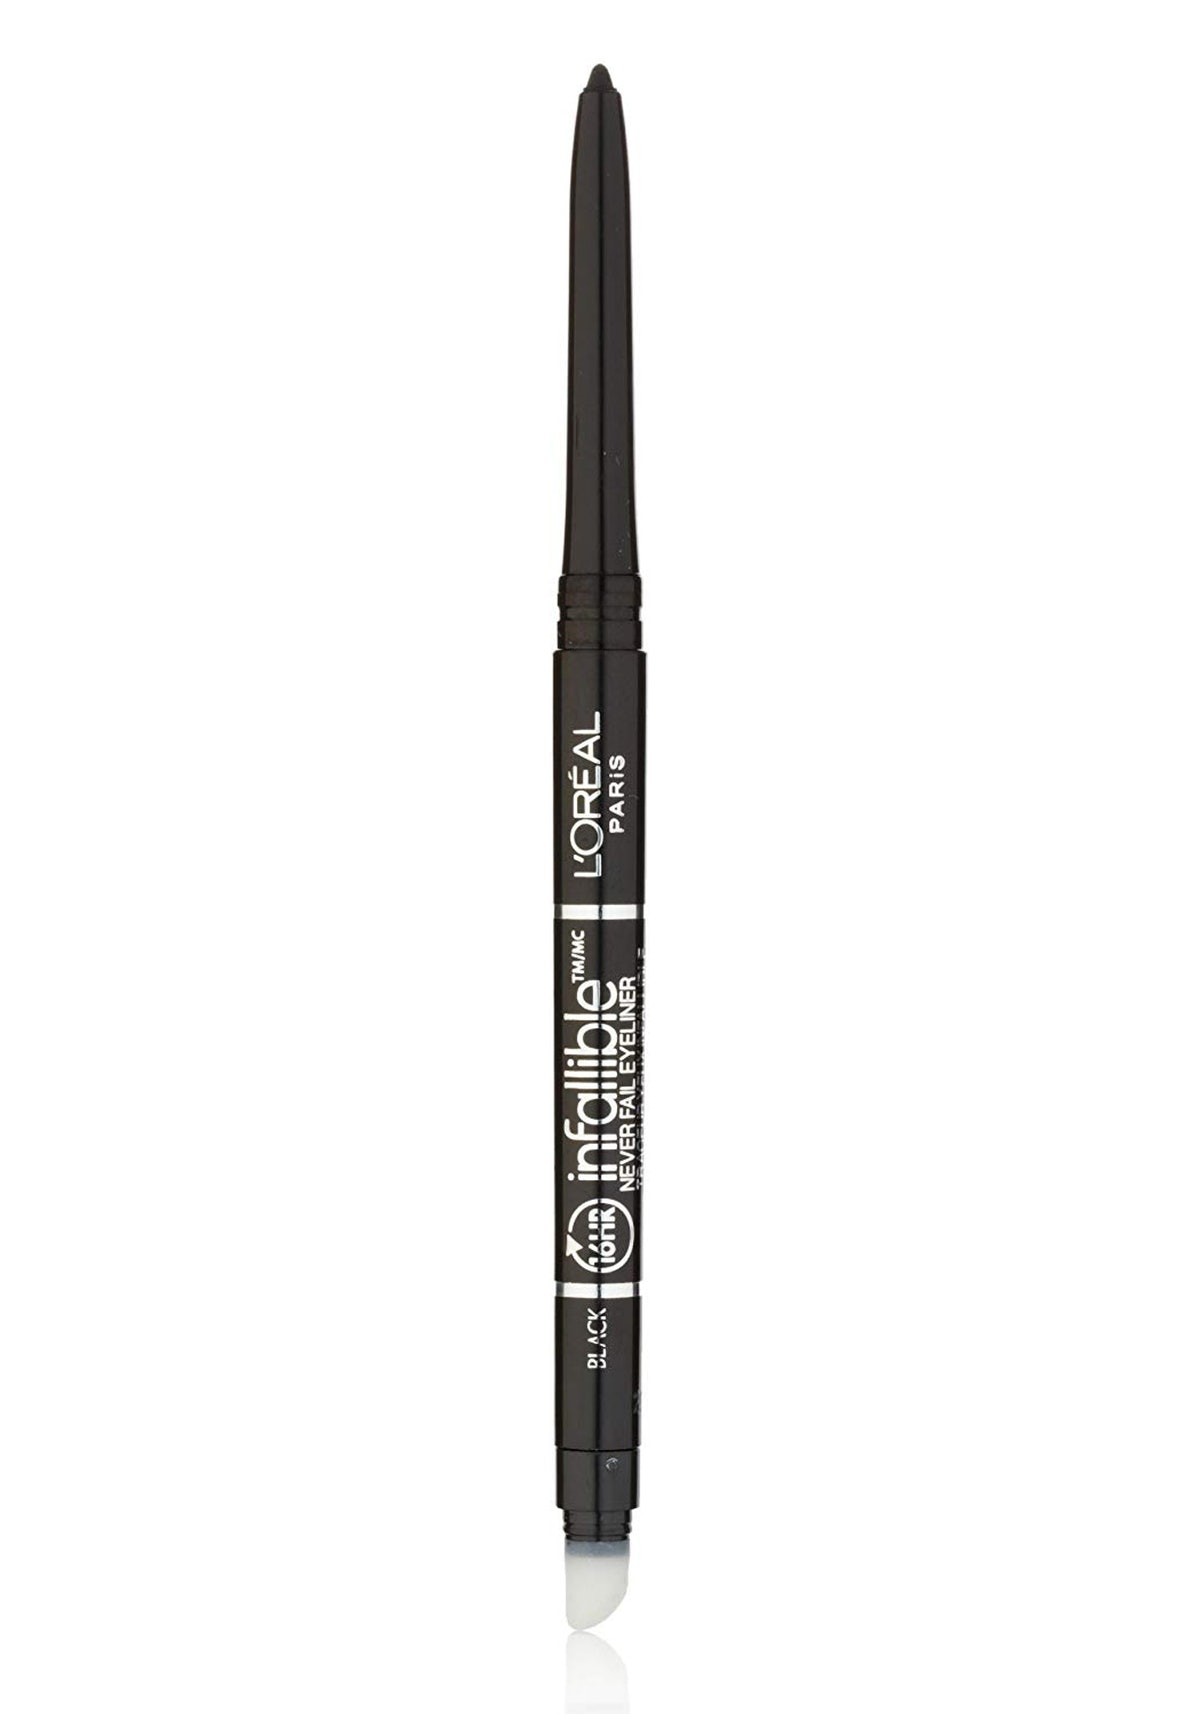 L'Oreal Paris Makeup Infallible Never Fail Original Mechanical Pencil Eyeliner with Built in Sharpen...